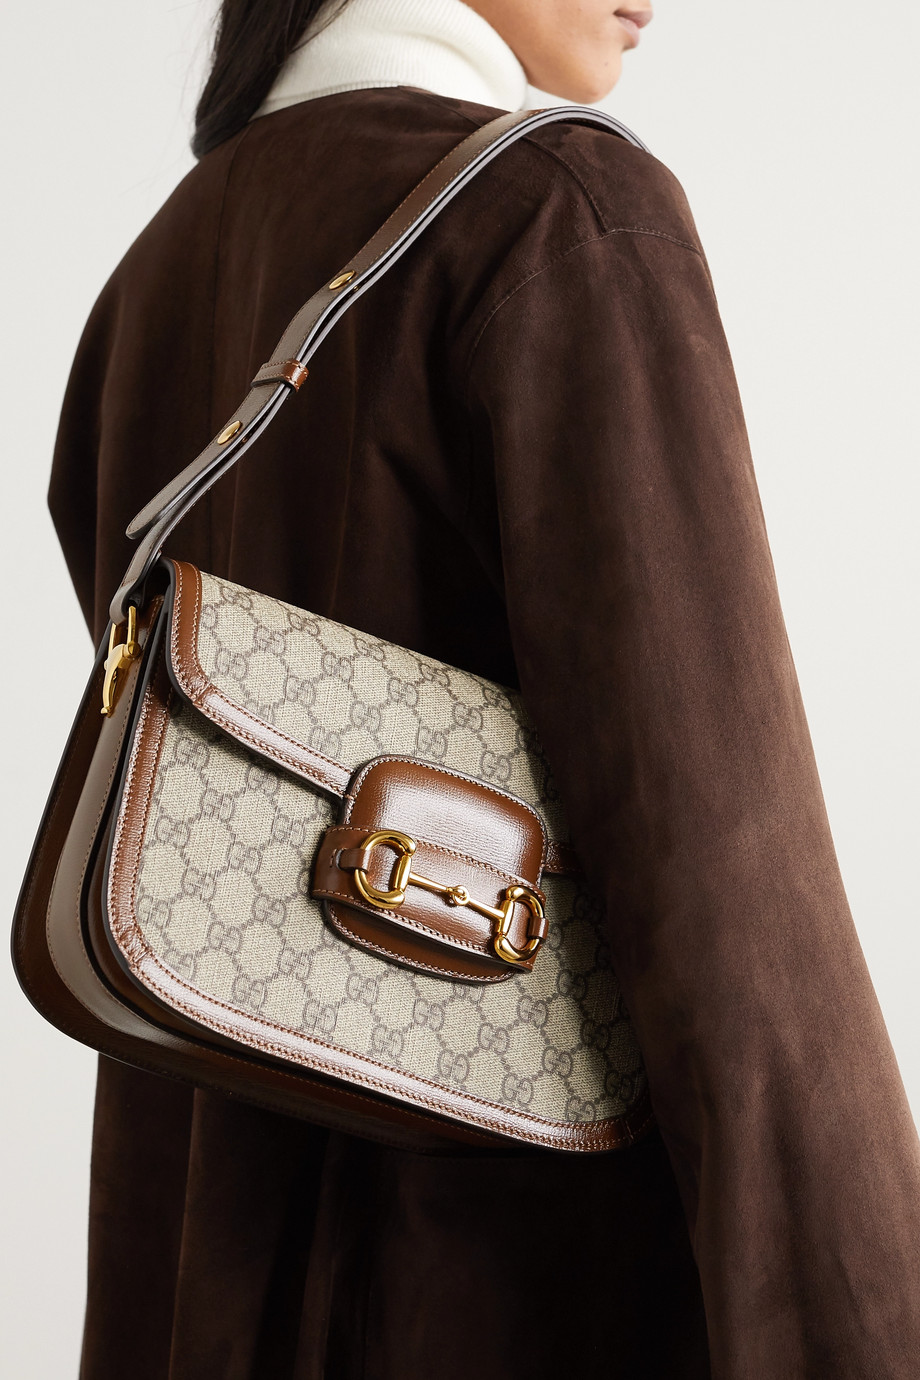 Gucci 1955 马衔扣细节皮革边饰印花涂层帆布单肩包